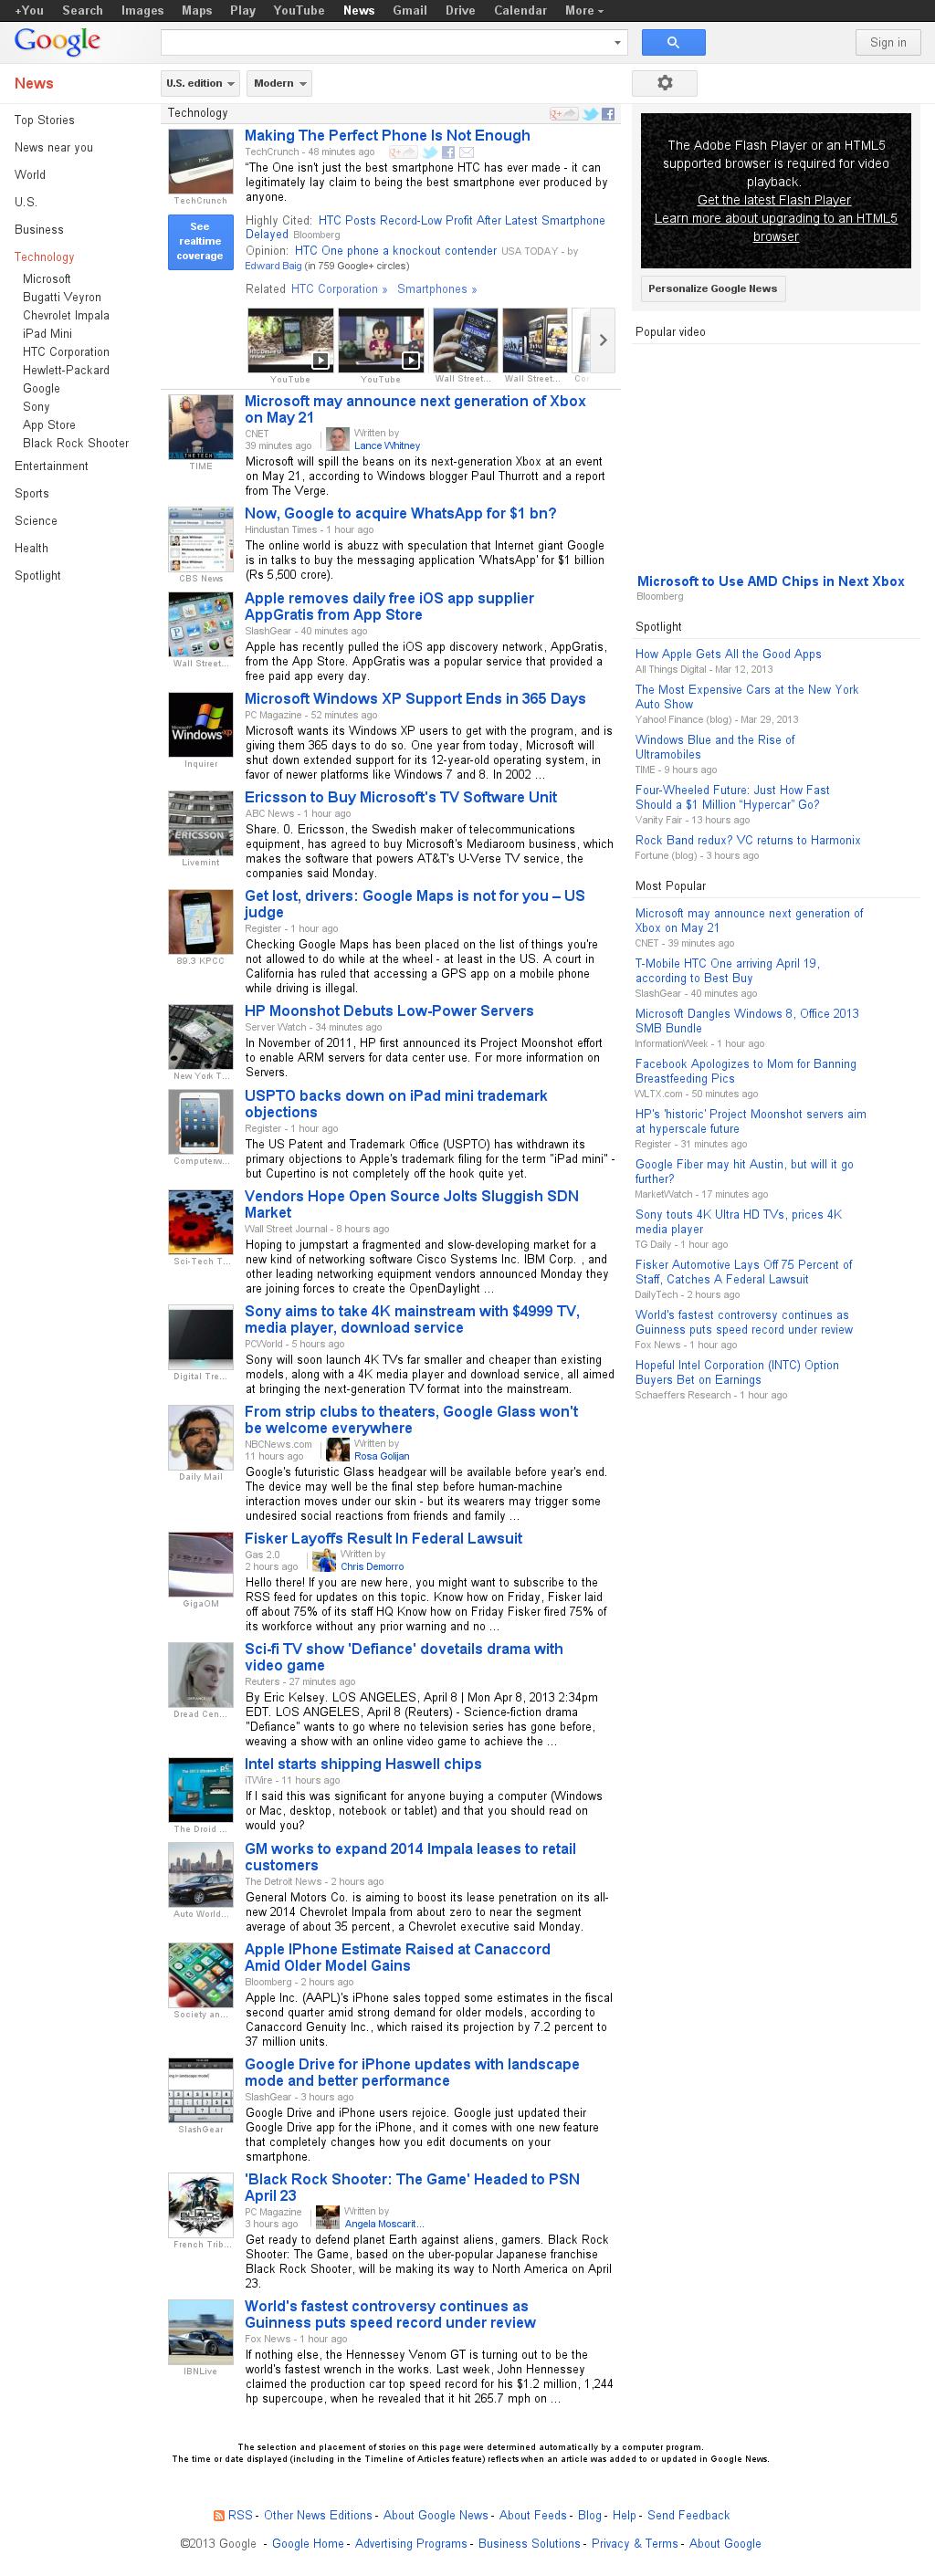 Google News: Technology at Monday April 8, 2013, 7:08 p.m. UTC